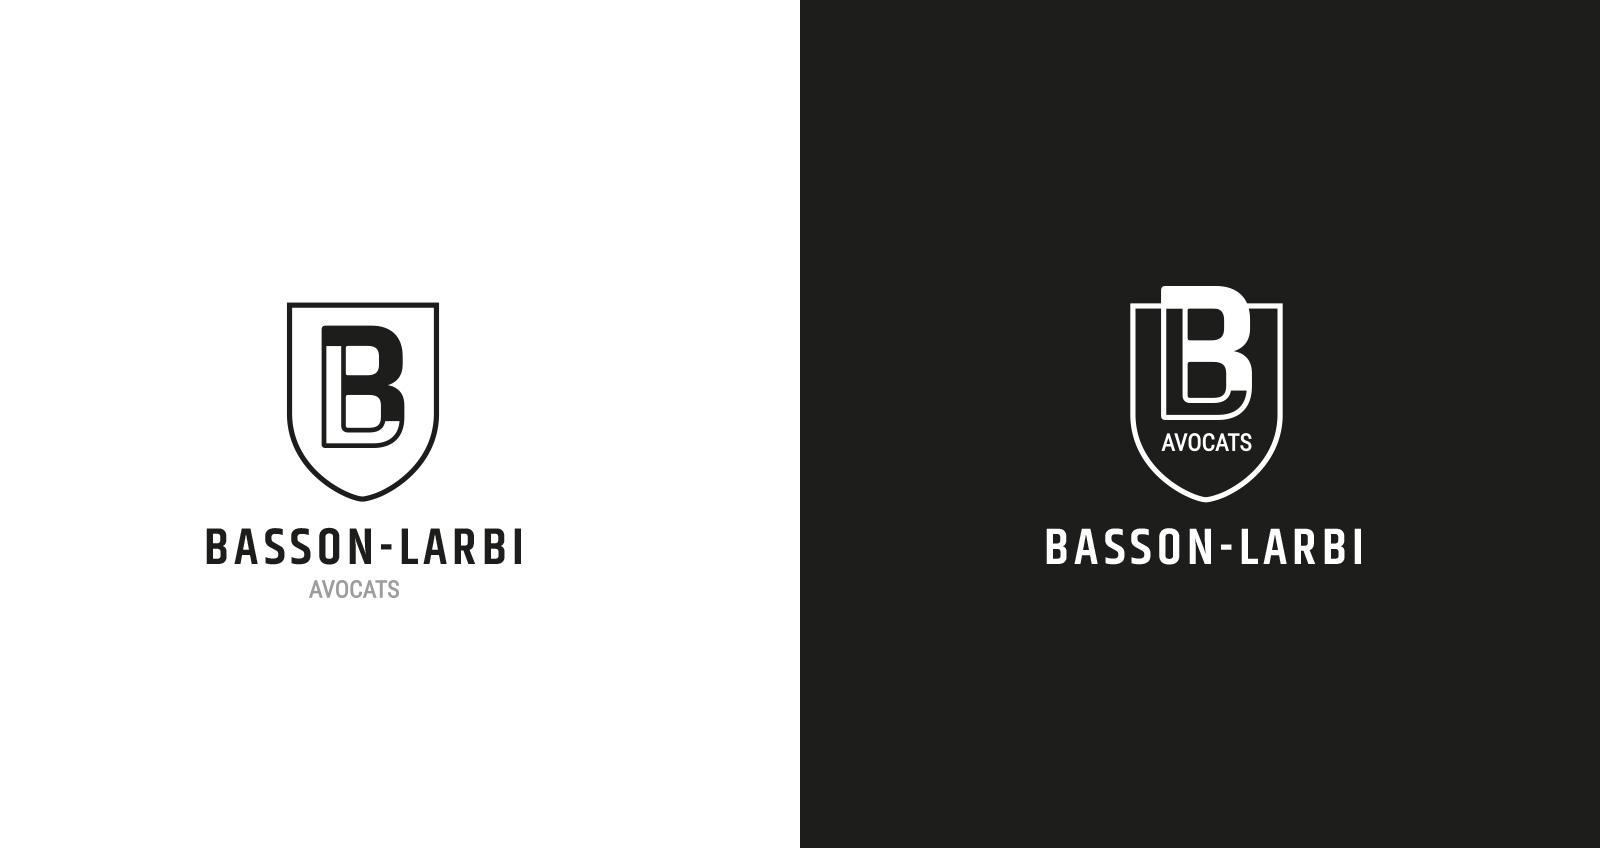 Declinaisons du logo du cabinet d'avocats Basson-Larbi Avocats - Studio-EVOL